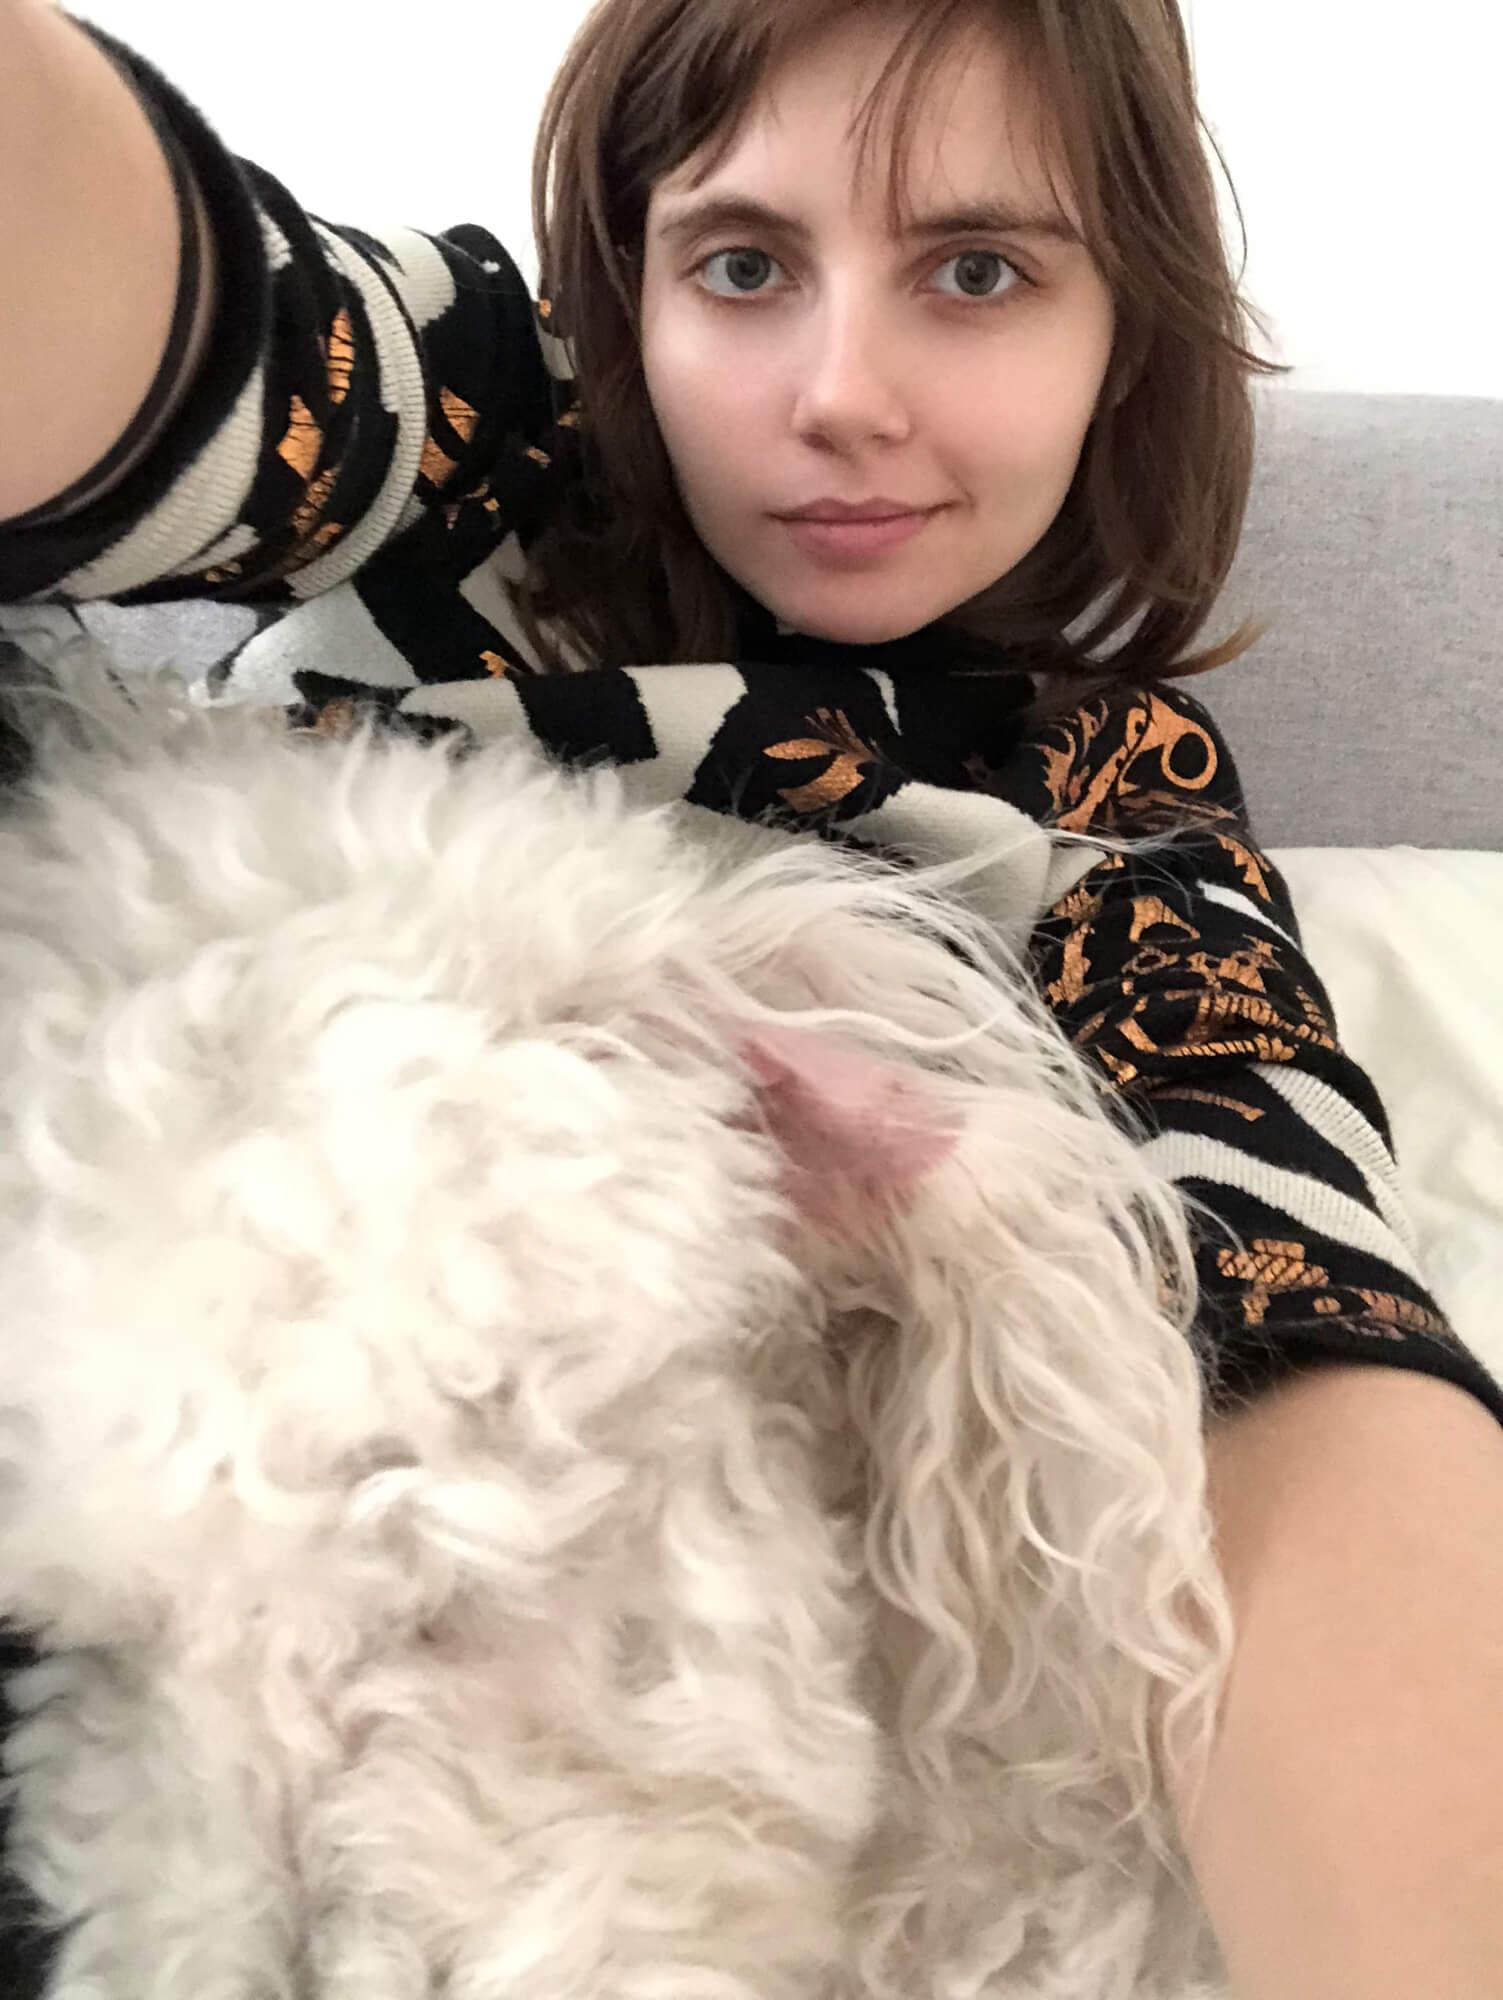 https://liararoux.xxx/wp-content/uploads/2018/10/Liara-Roux-Selfies-and-Snapshots-September-2018-056.jpg